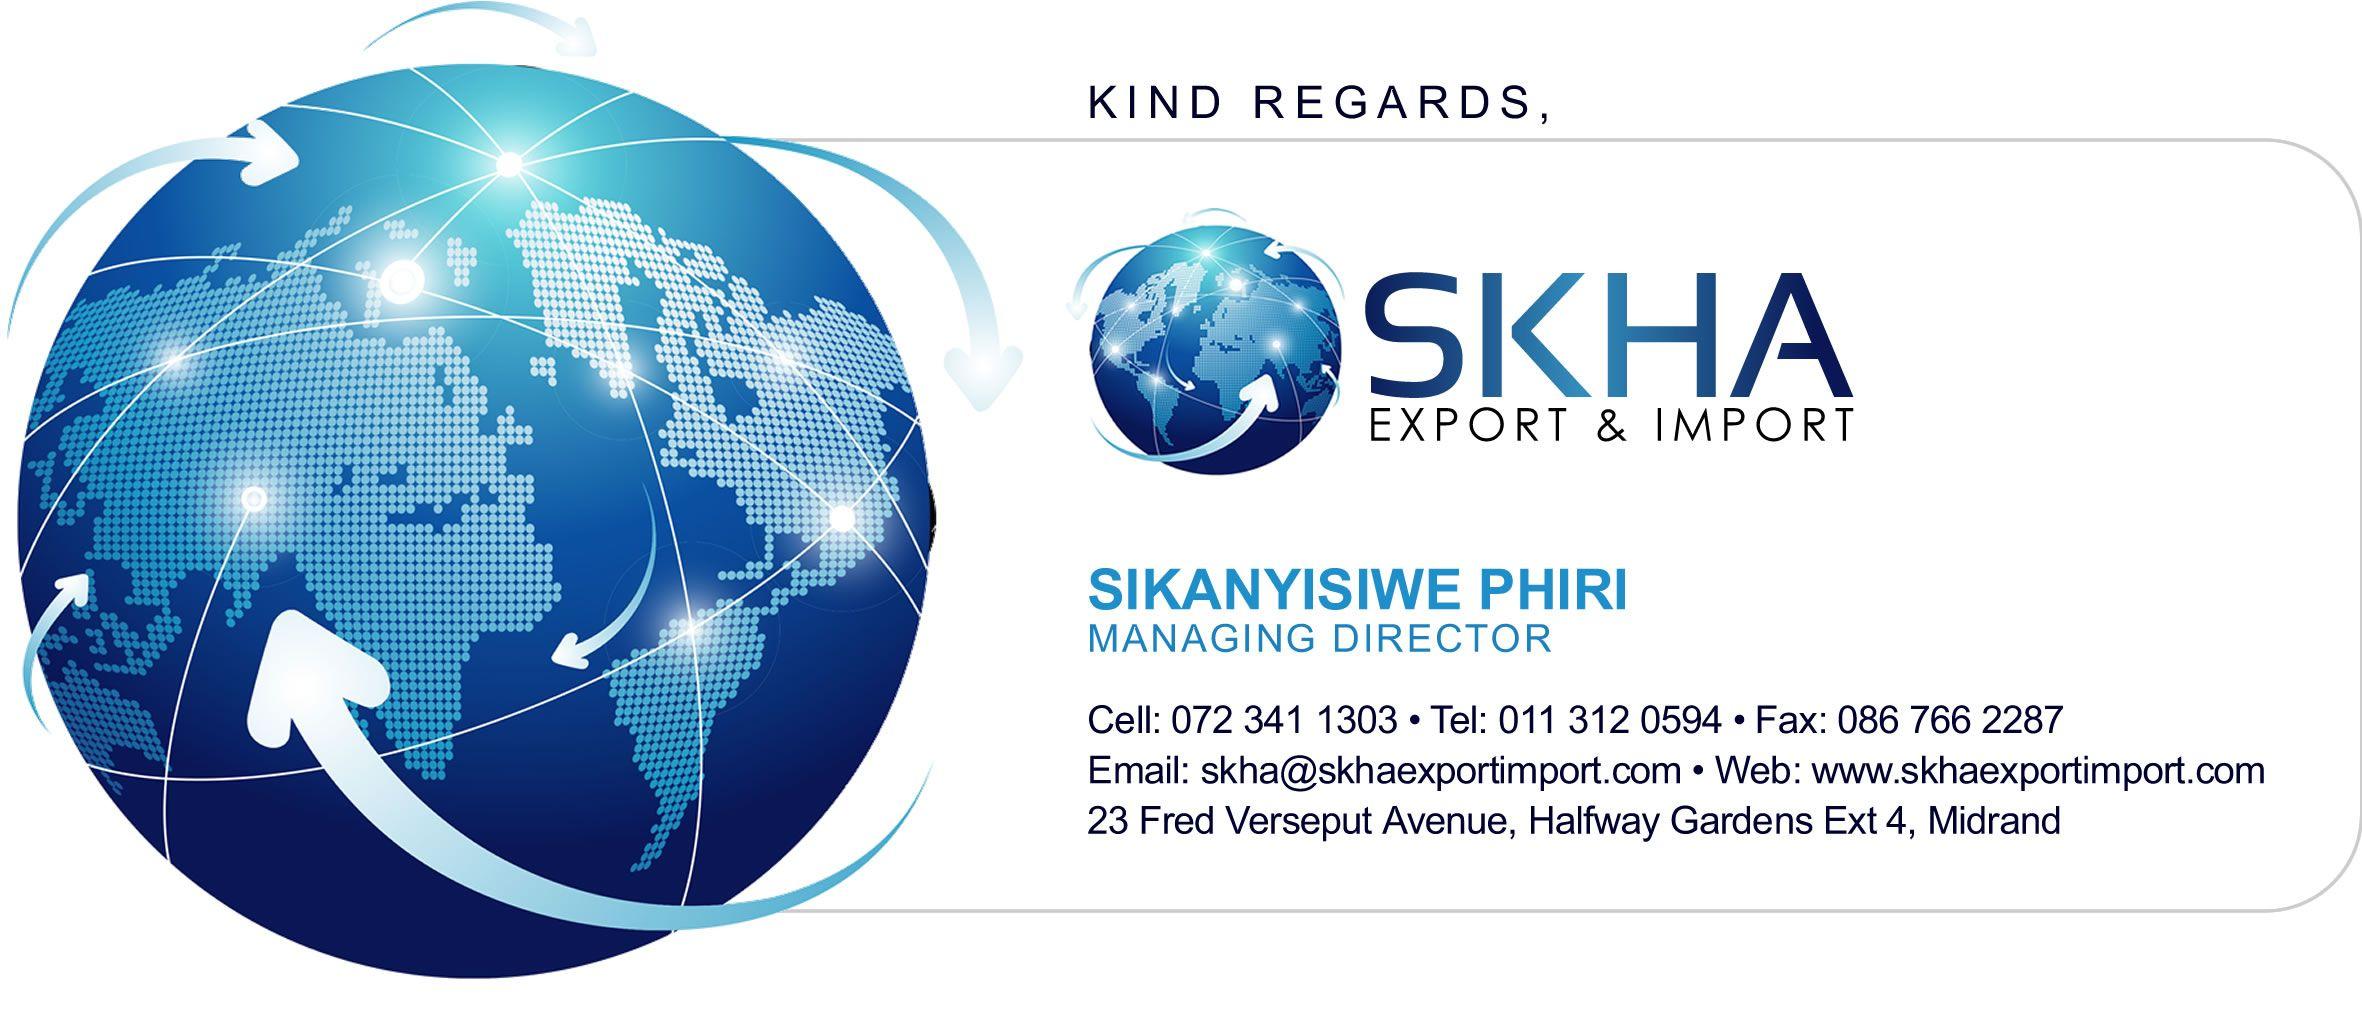 Wonderful Business Card Email Signature Photos - Business Card Ideas ...